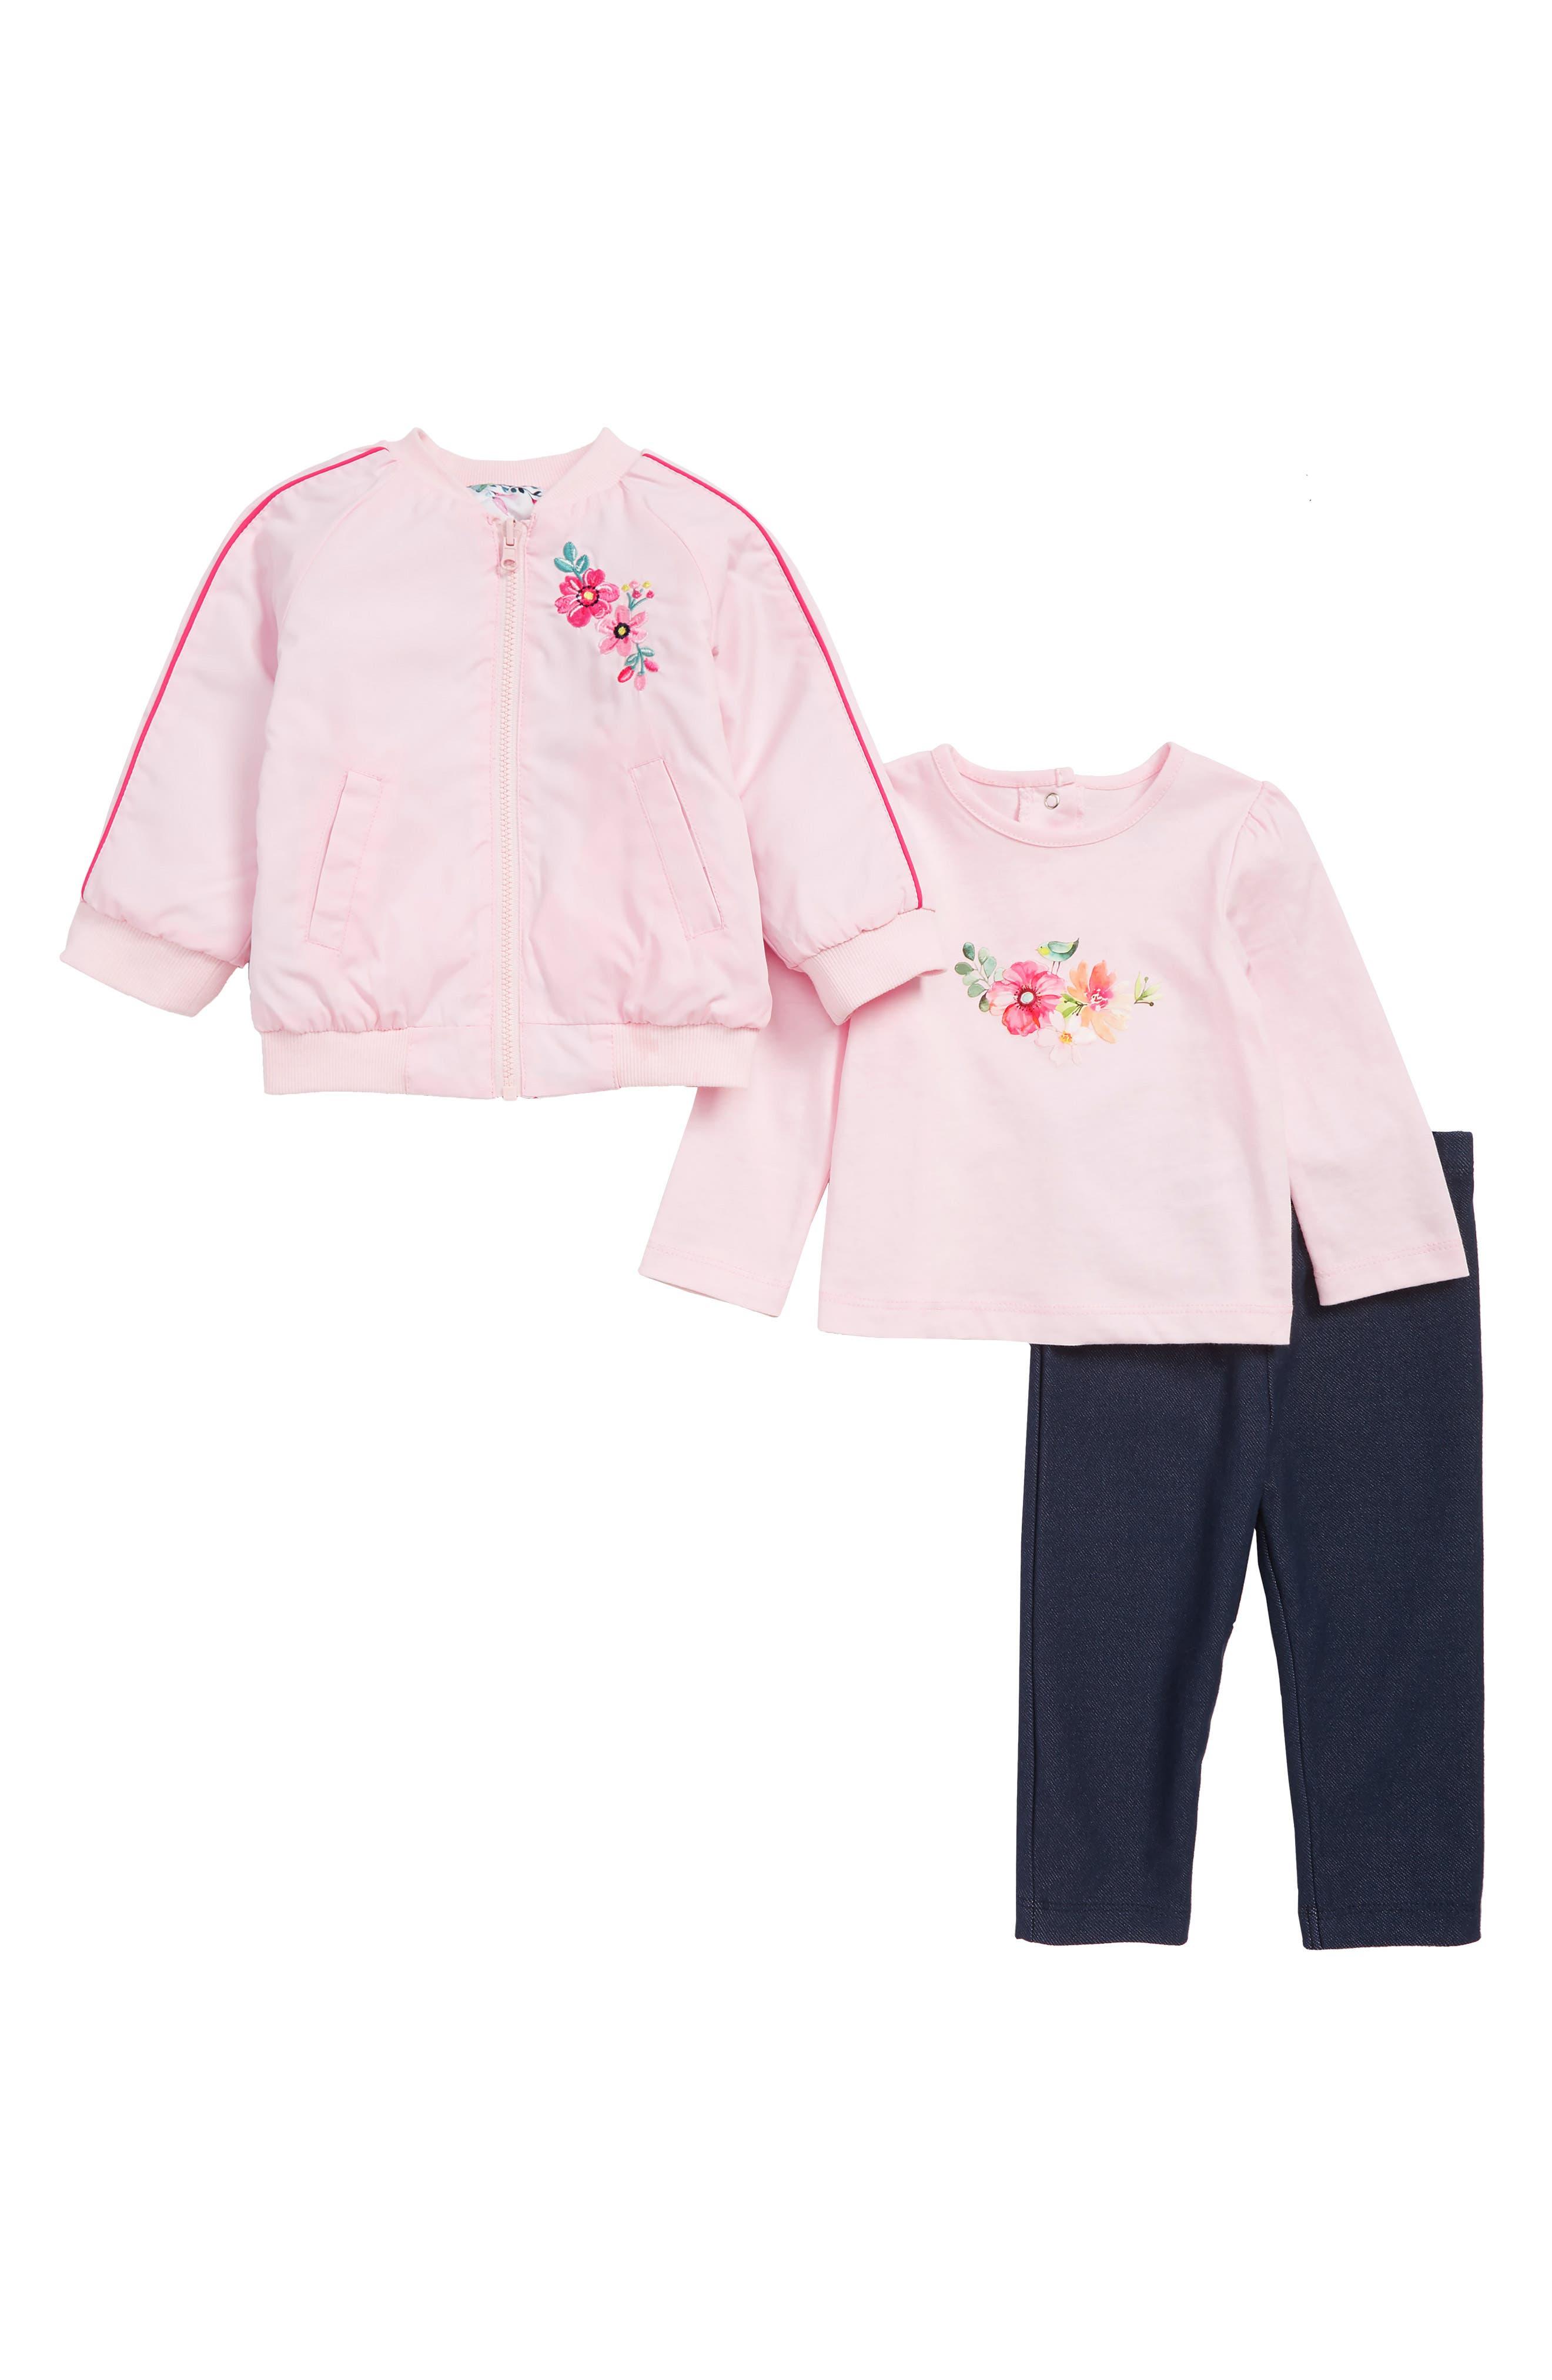 LITTLE ME,                             Reversible Jacket, T-Shirt & Leggings Set,                             Alternate thumbnail 2, color,                             PINK MULTI